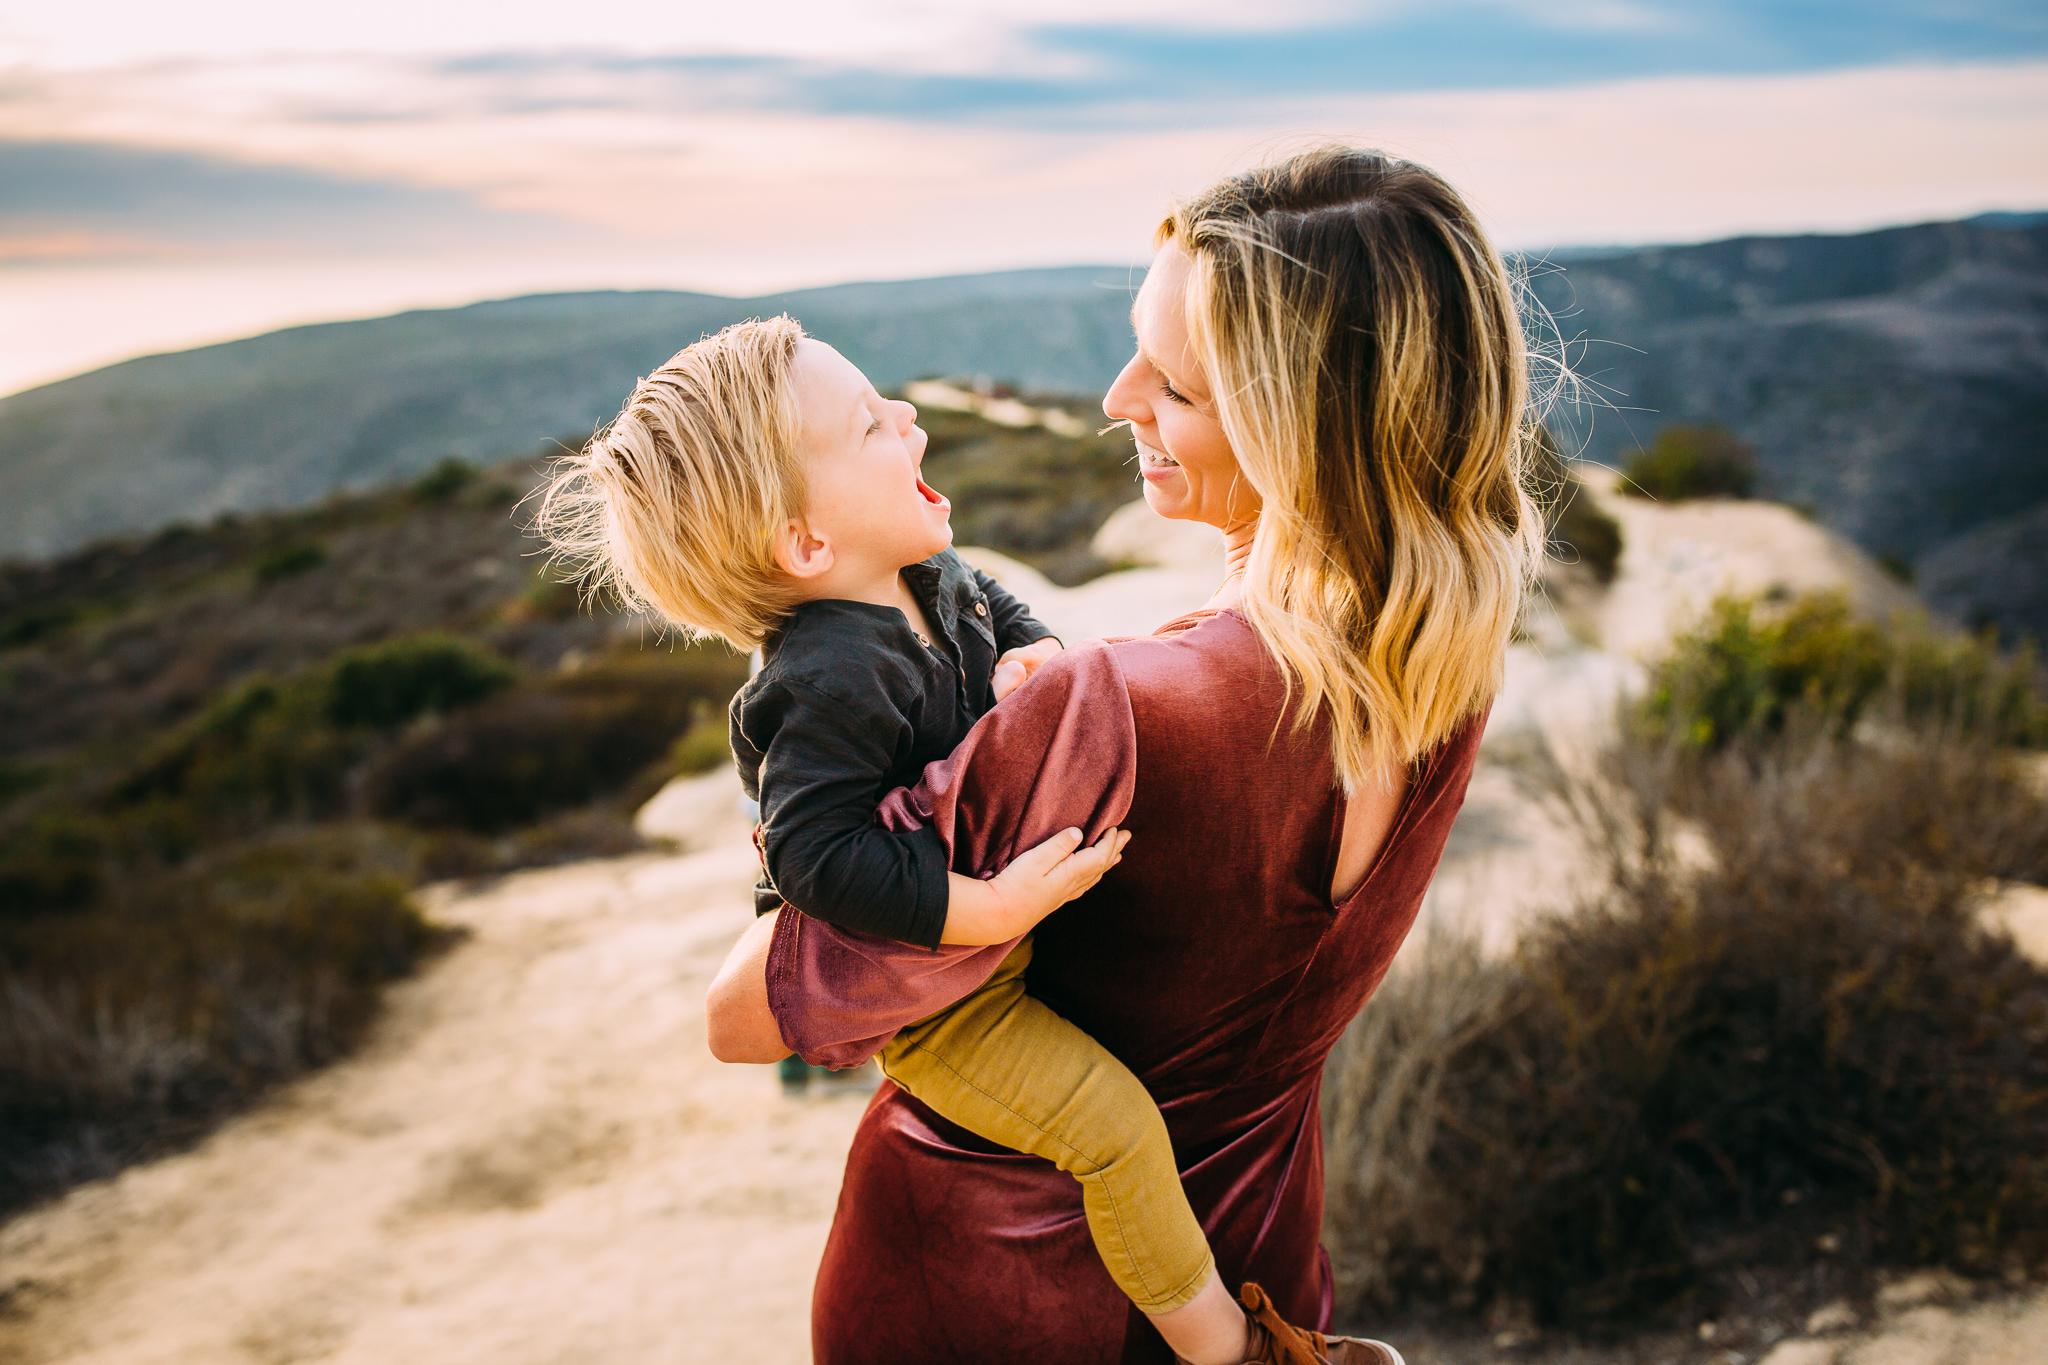 orangecountyfamilyphotographer2-6.jpg